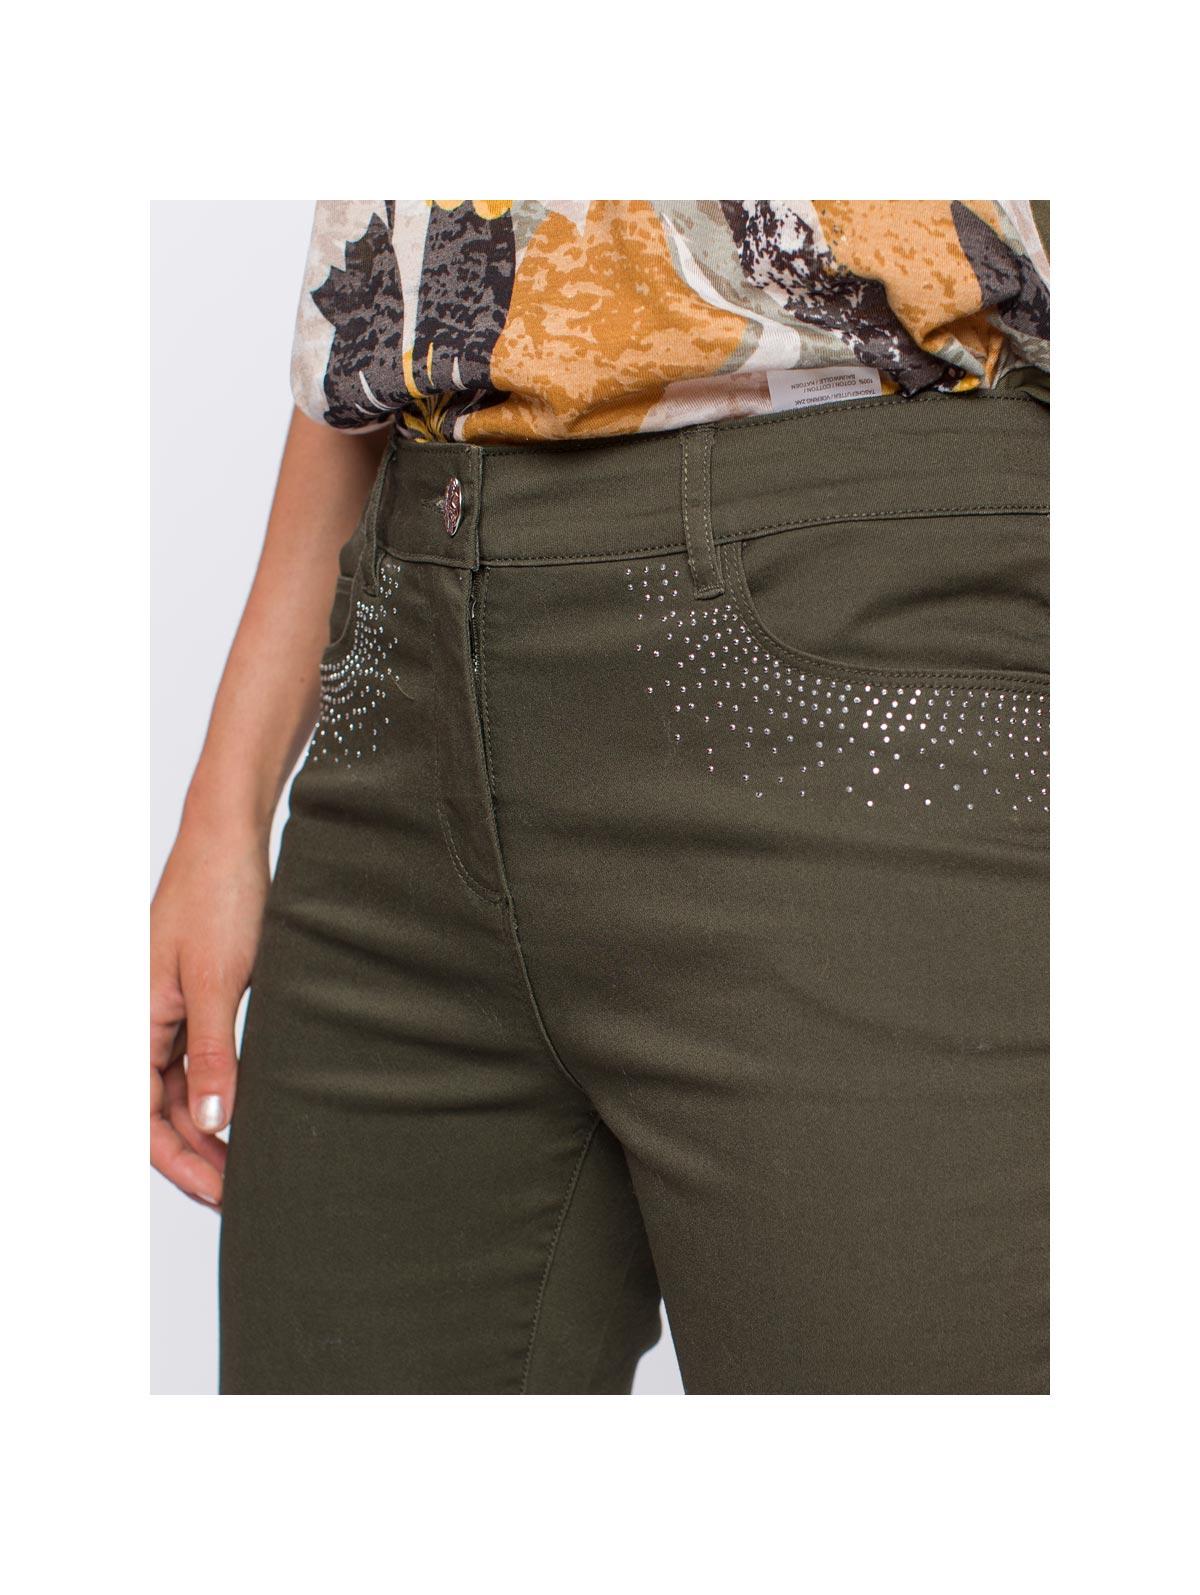 Pantalon twill poches strass - maboutiqueplus